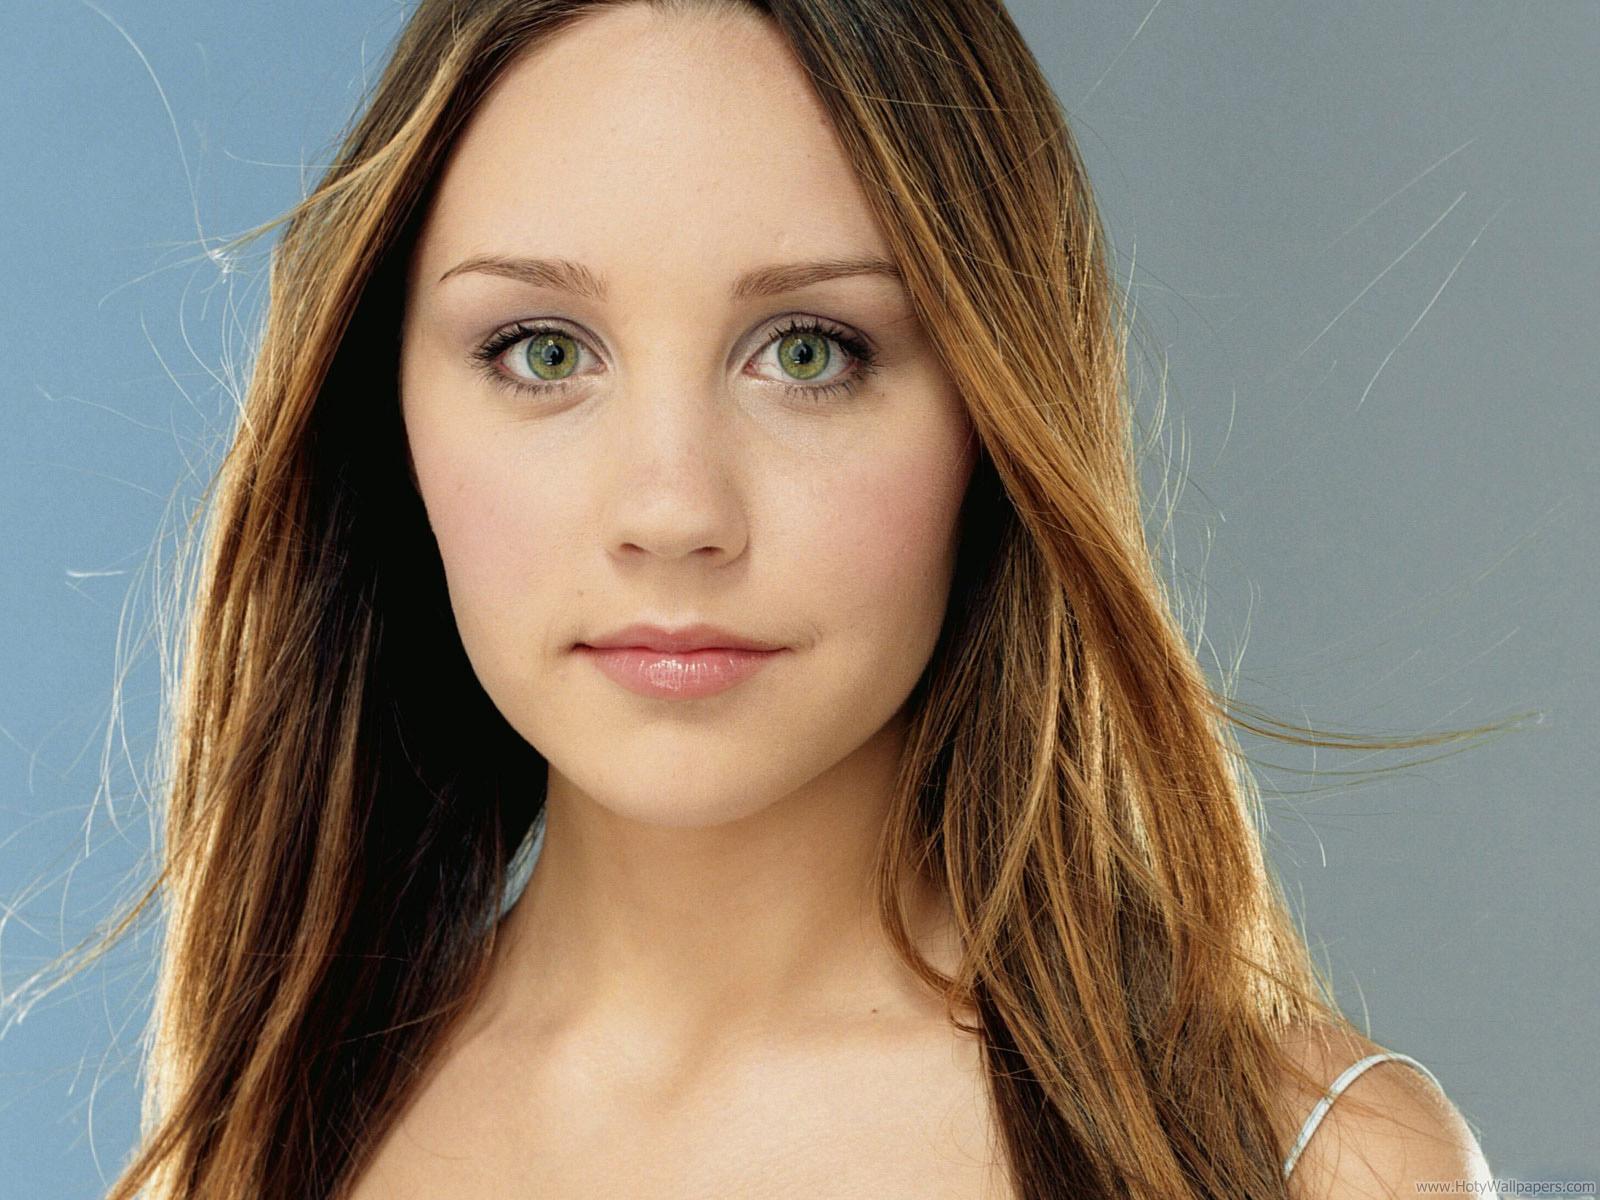 http://4.bp.blogspot.com/-x6gI3g46-7s/Tvx3qNapDVI/AAAAAAAABYU/BmgYXywrcQg/s1600/amanda_bynes_hollywood_actress_wallpaper-06.jpg